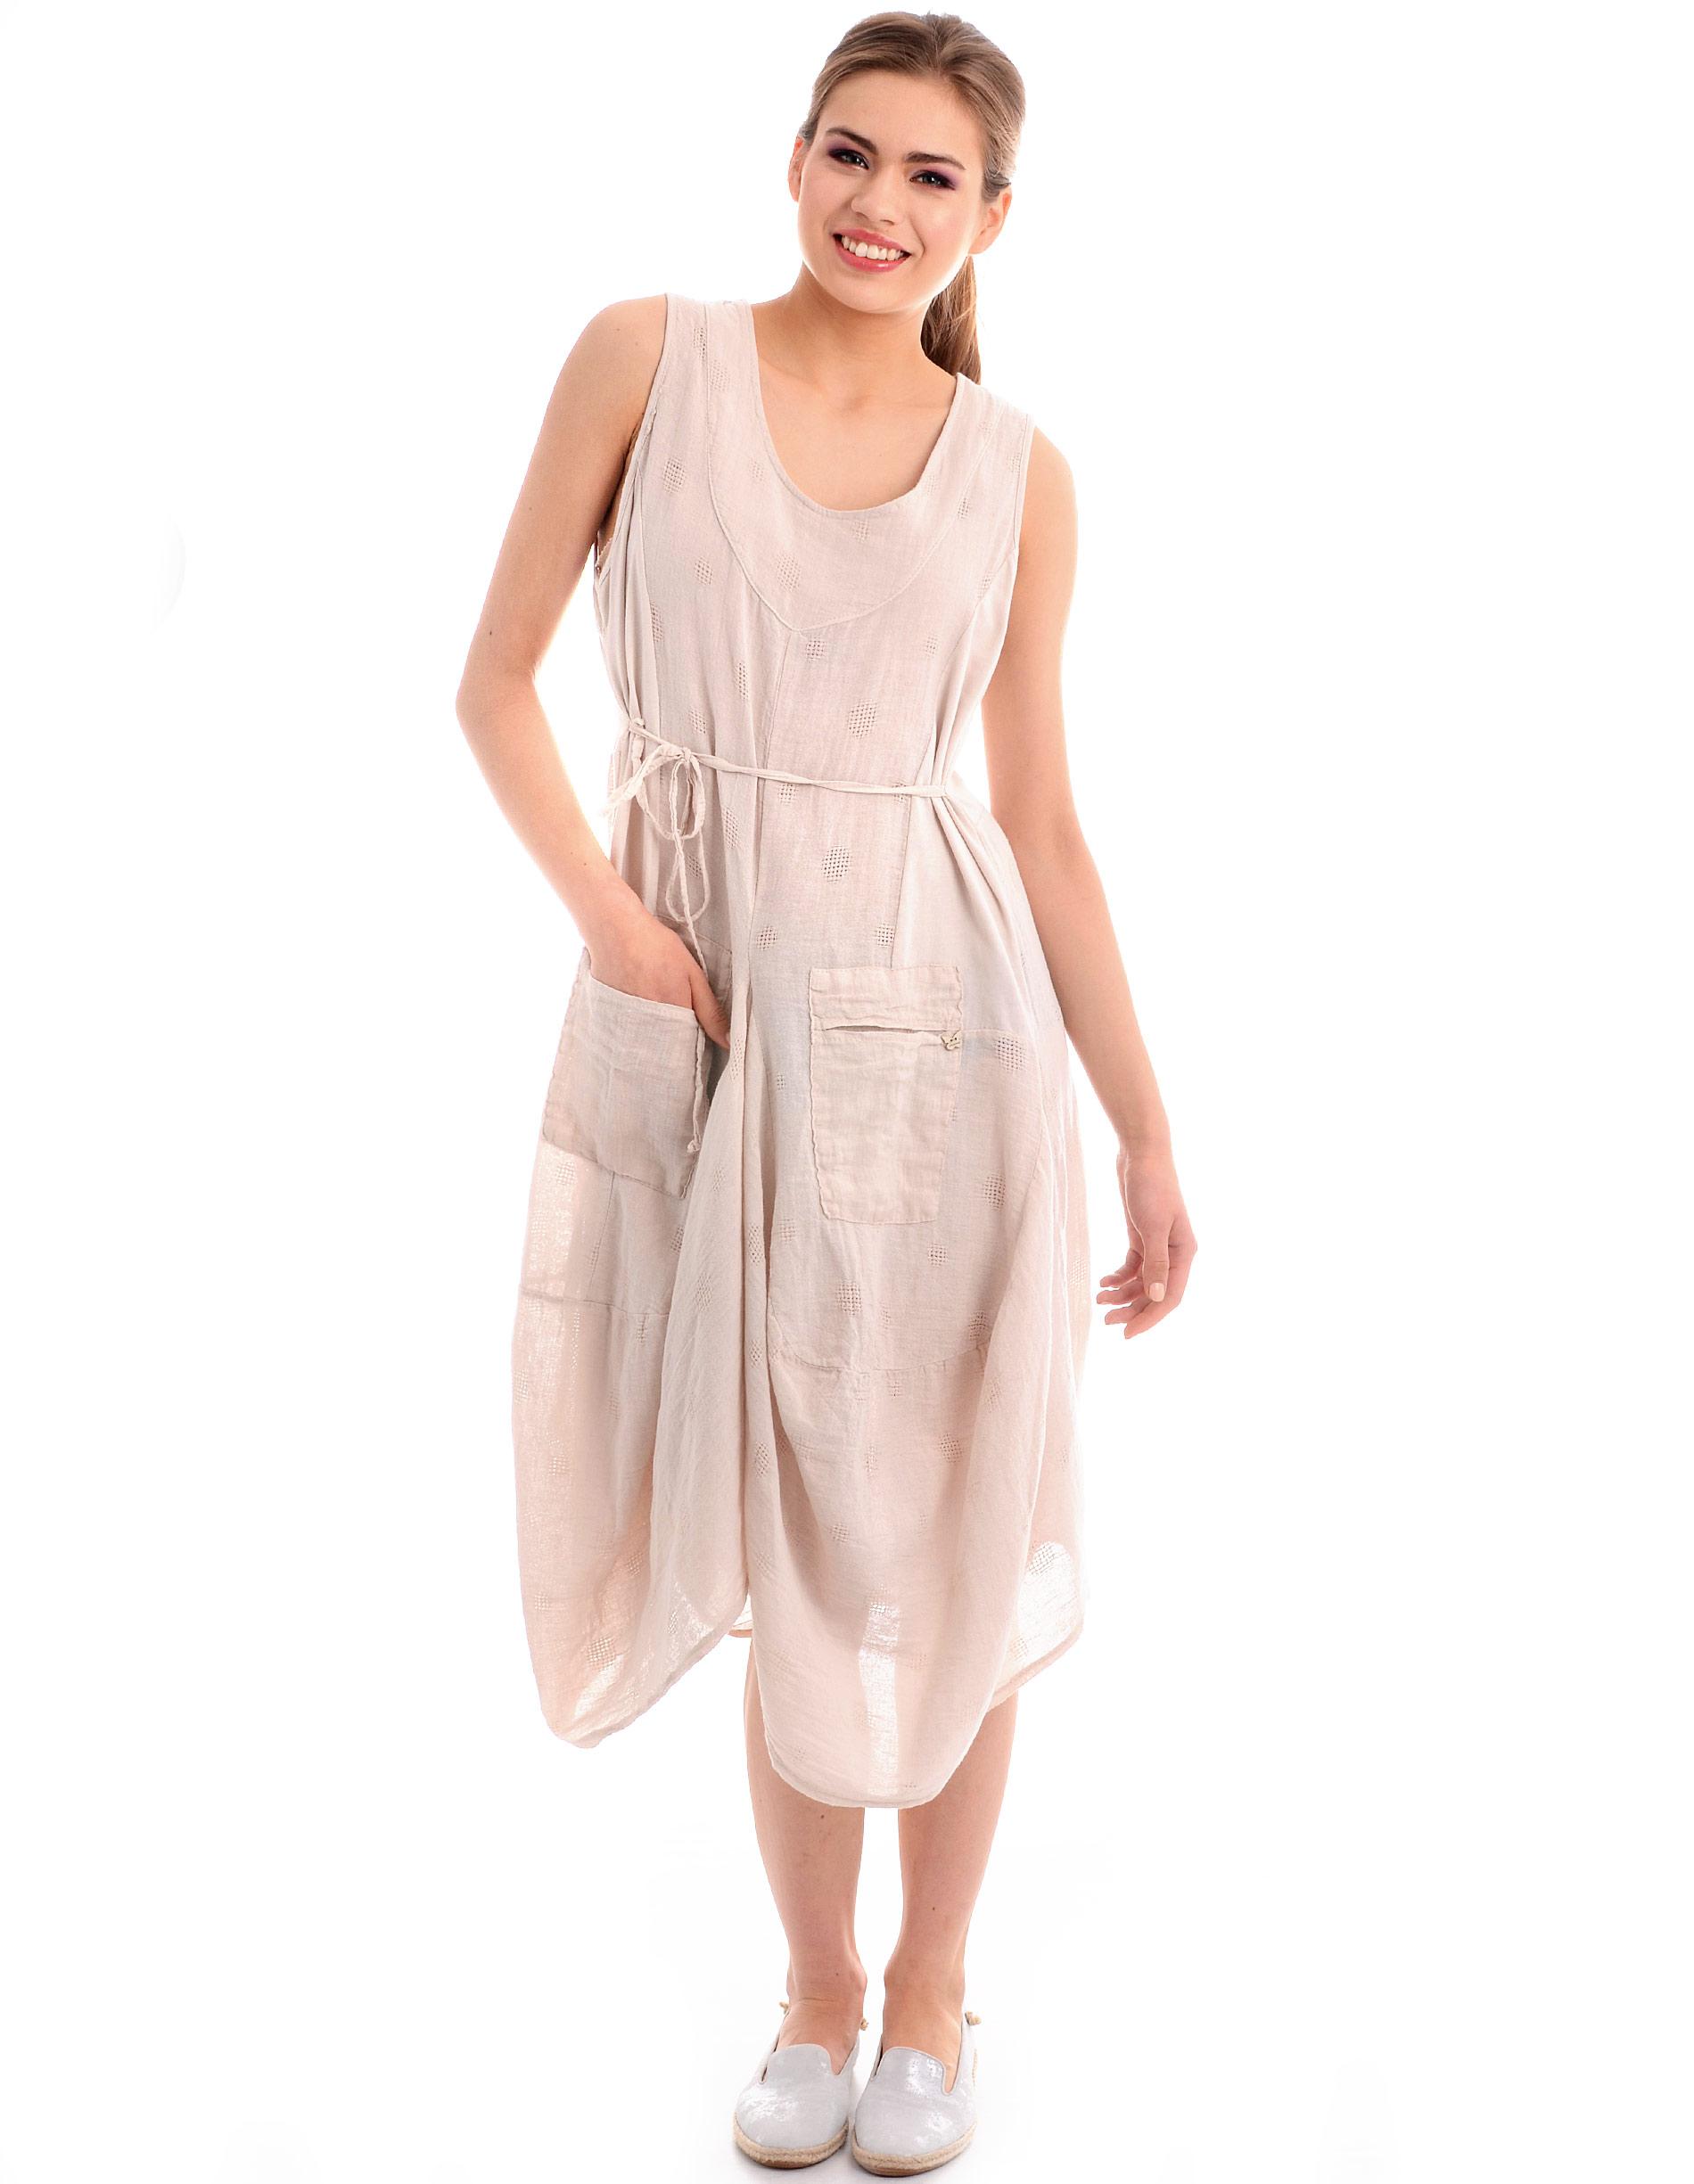 Sukienka - 1-88014 BEIGE - Unisono